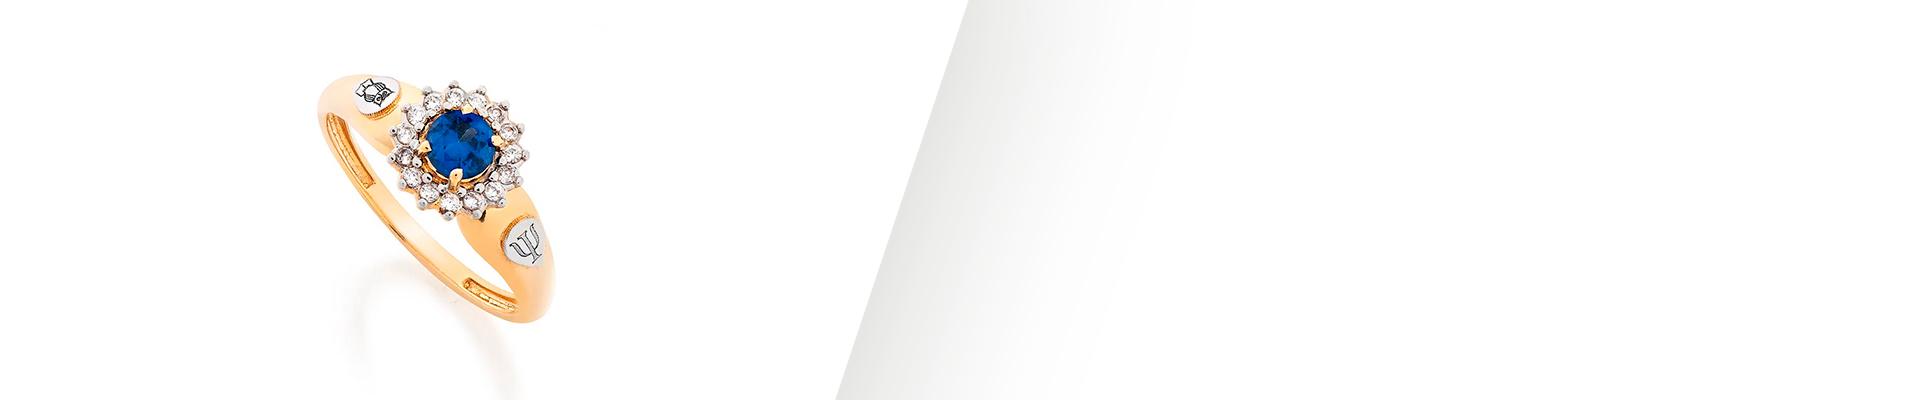 Banner Anel de Formatura